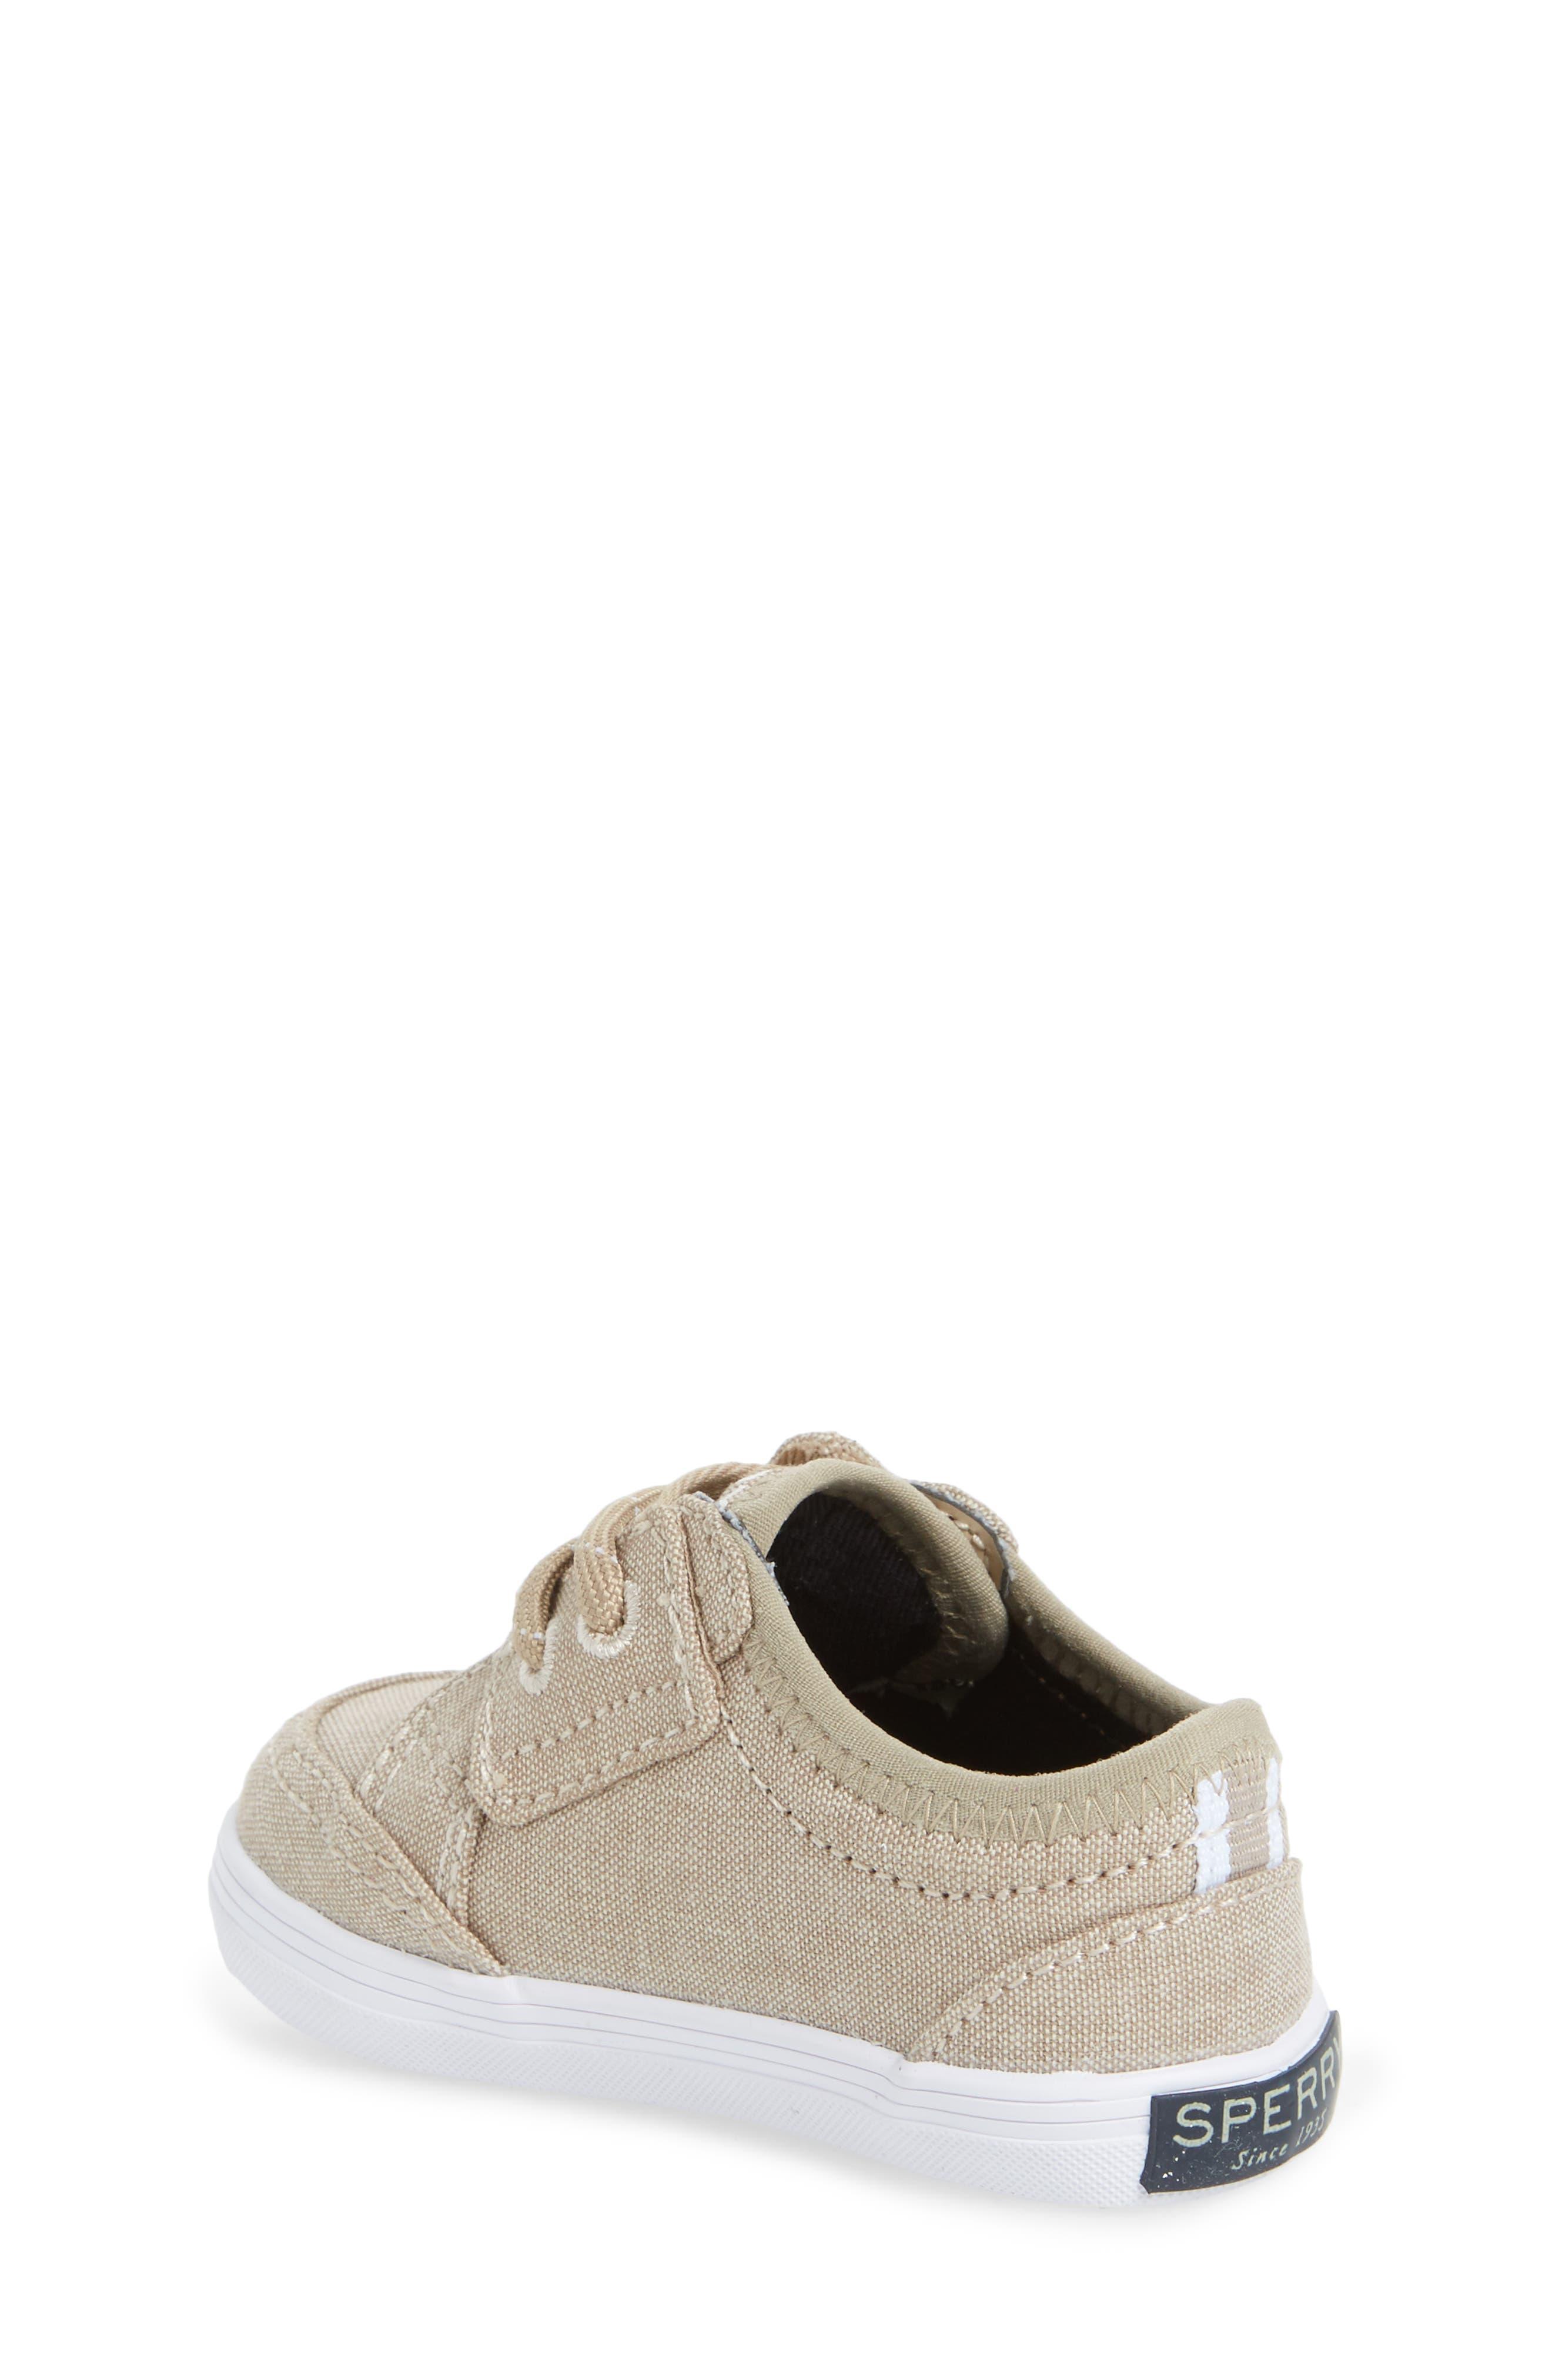 Deckfin Crib Jr. Sneaker,                             Alternate thumbnail 2, color,                             Khaki